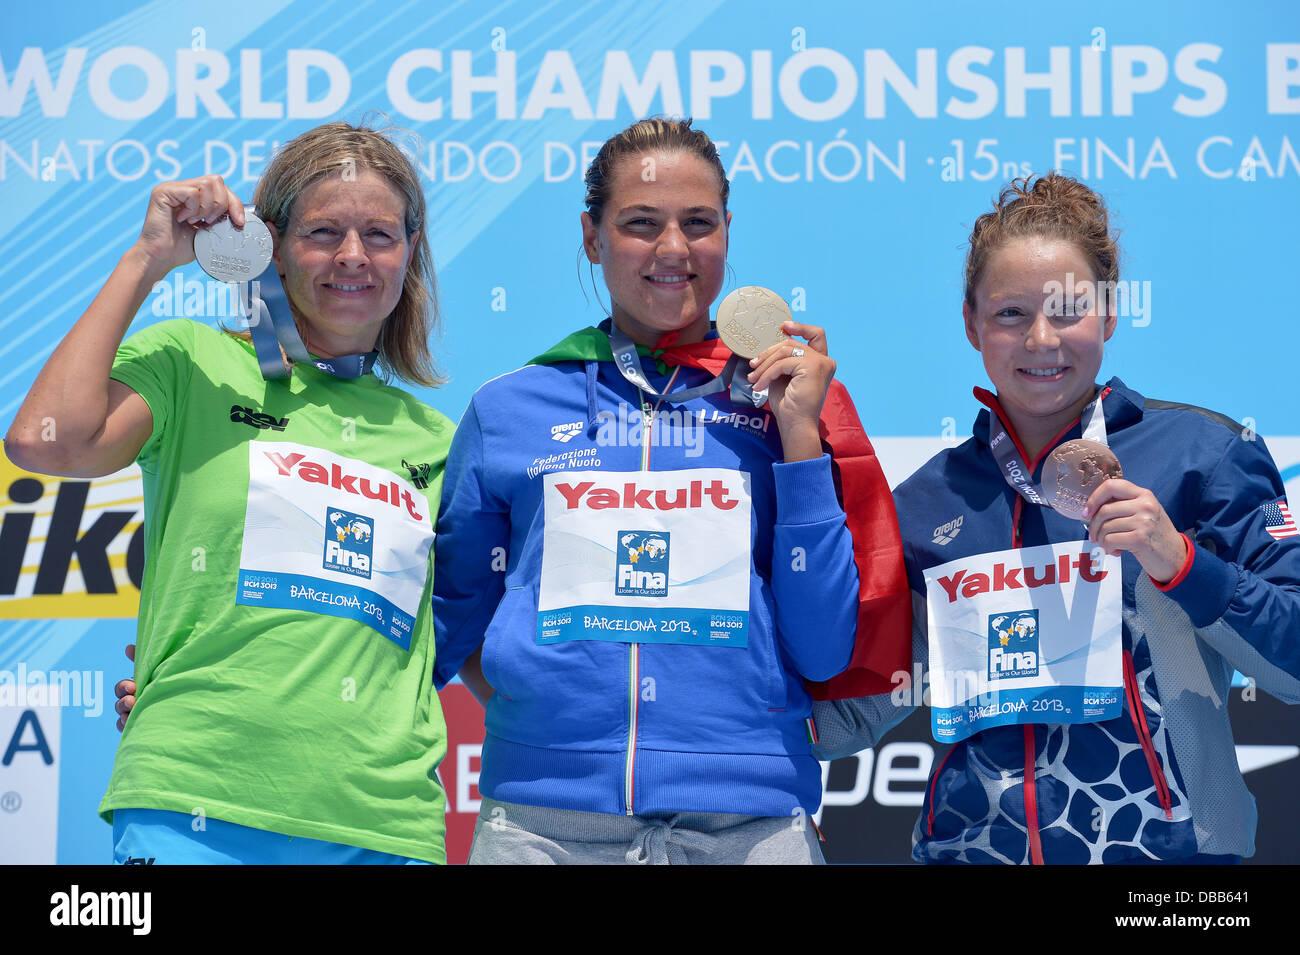 Barcelona, Spain. 27th July, 2013. Gold medalist Martina Grimaldi (C) of Italy, 2nd Angela Alexandra Maurer (L) Stock Photo